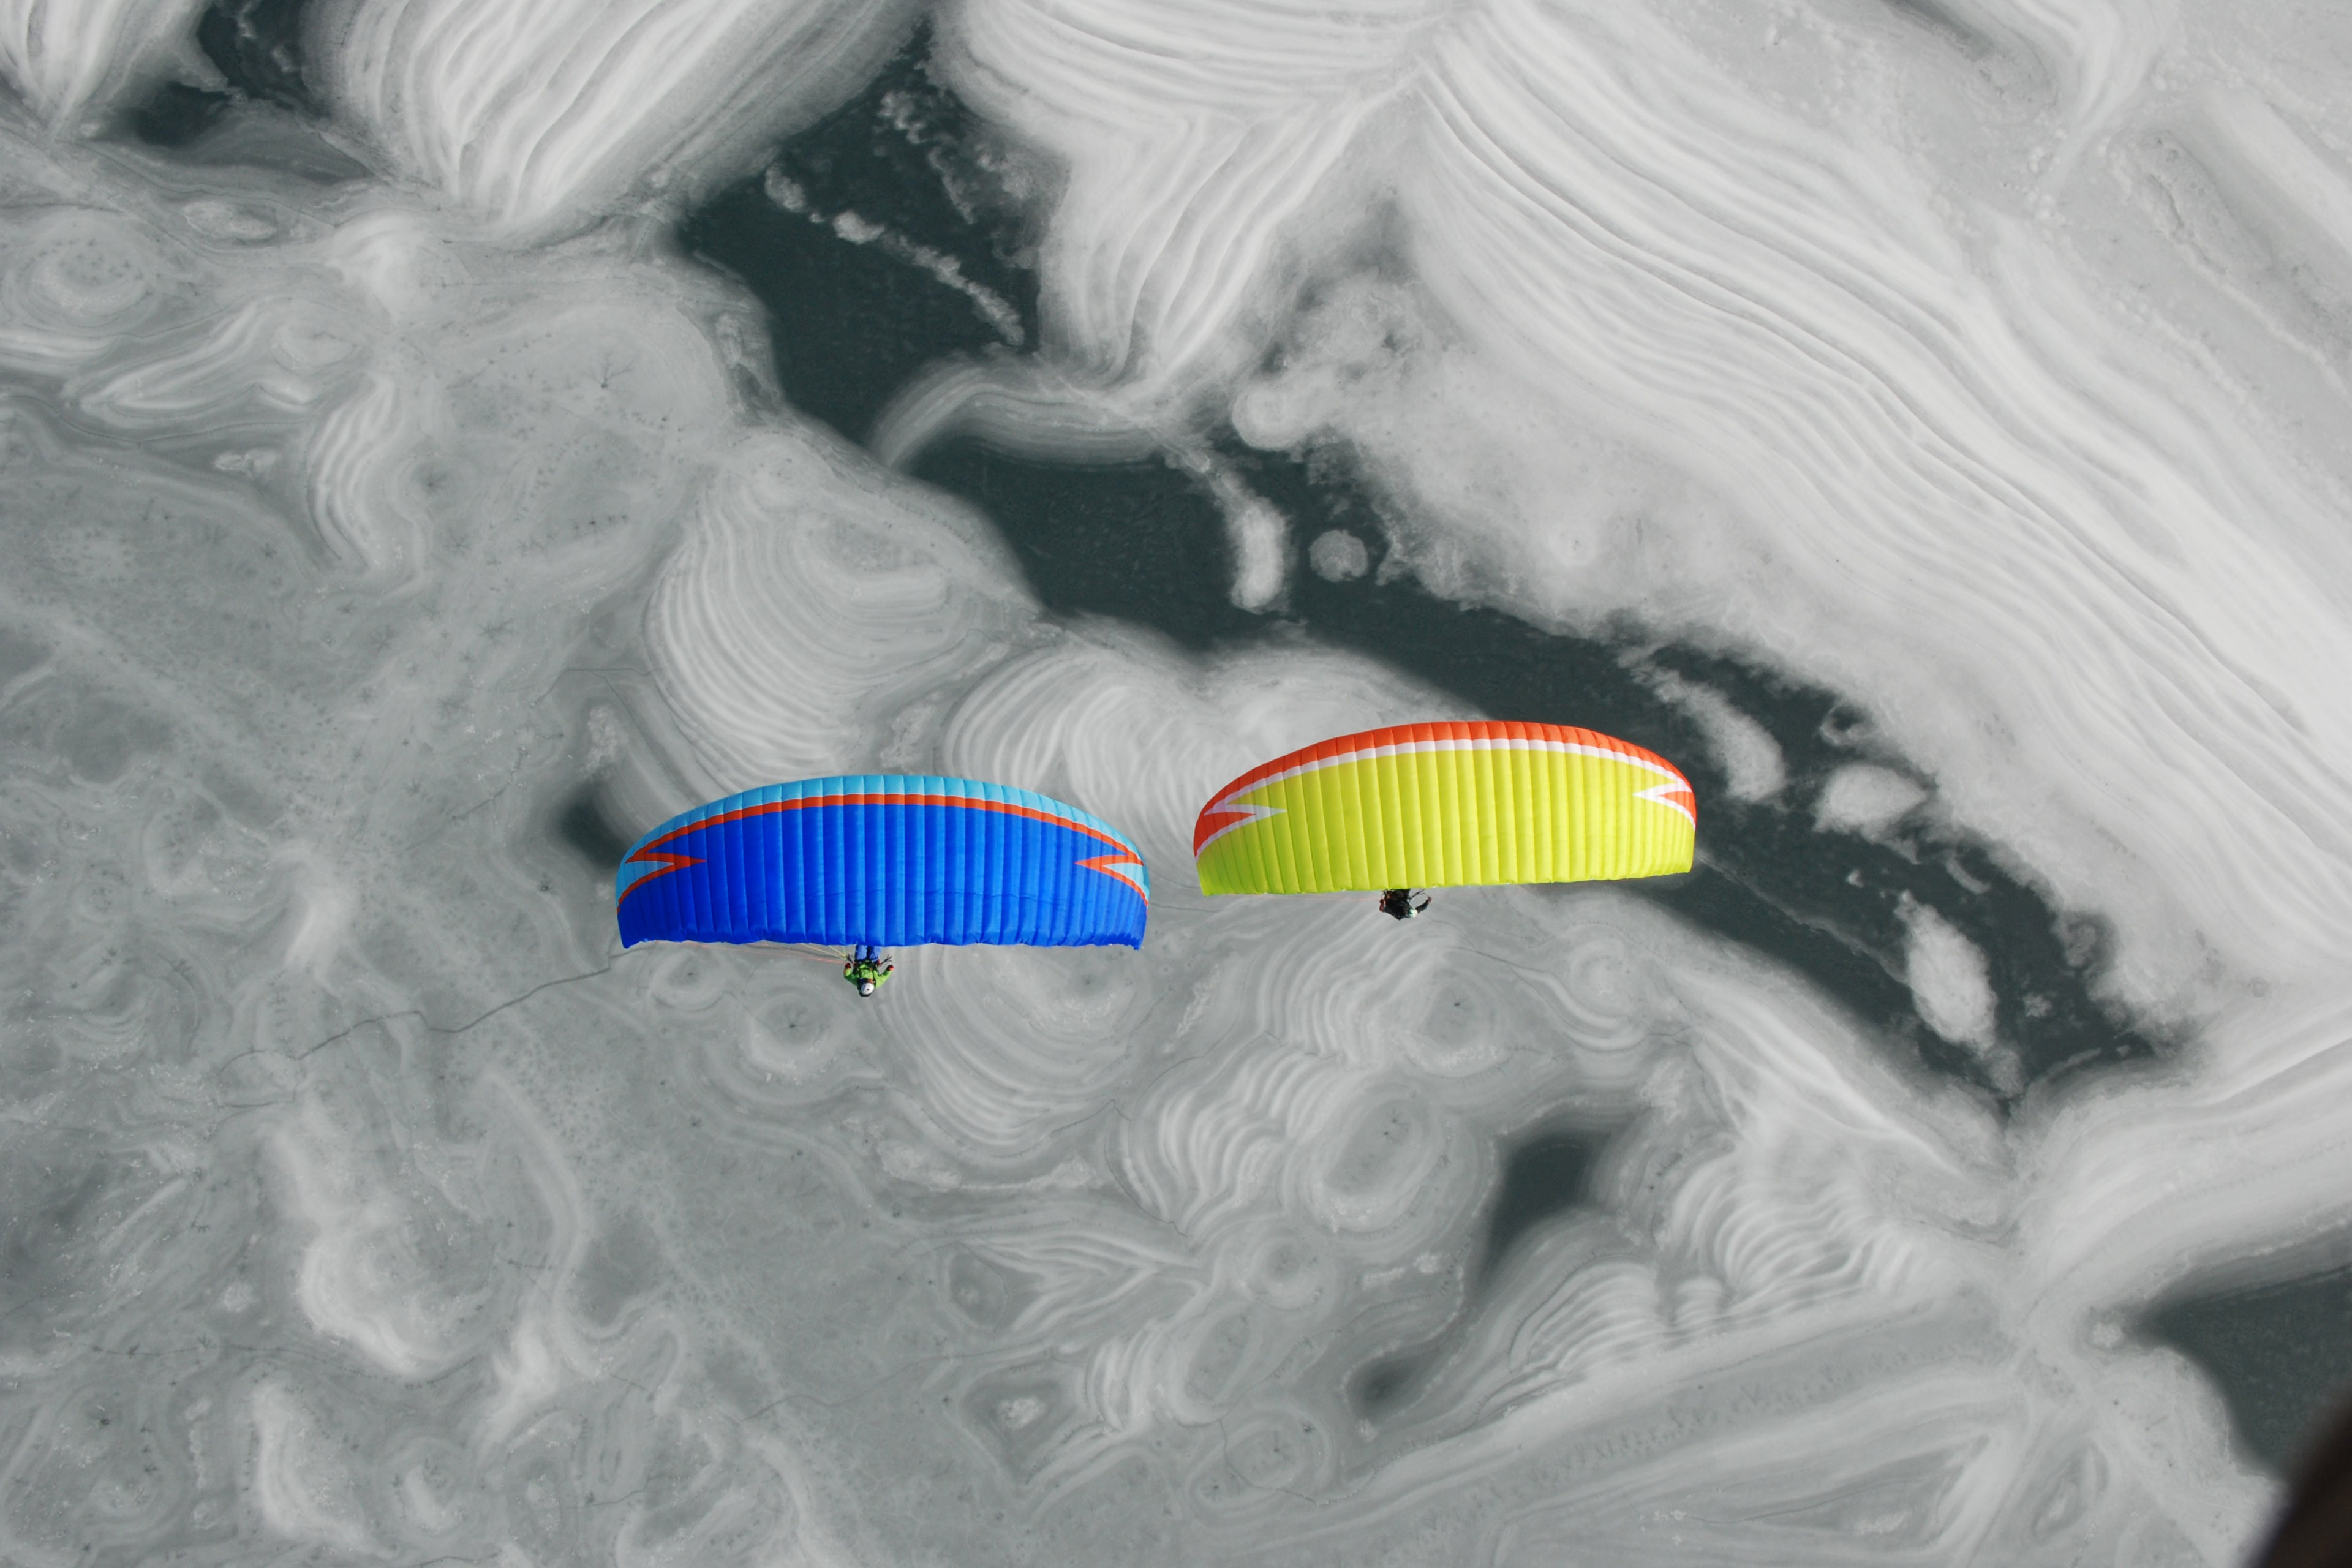 Paragliding above frozen a lake